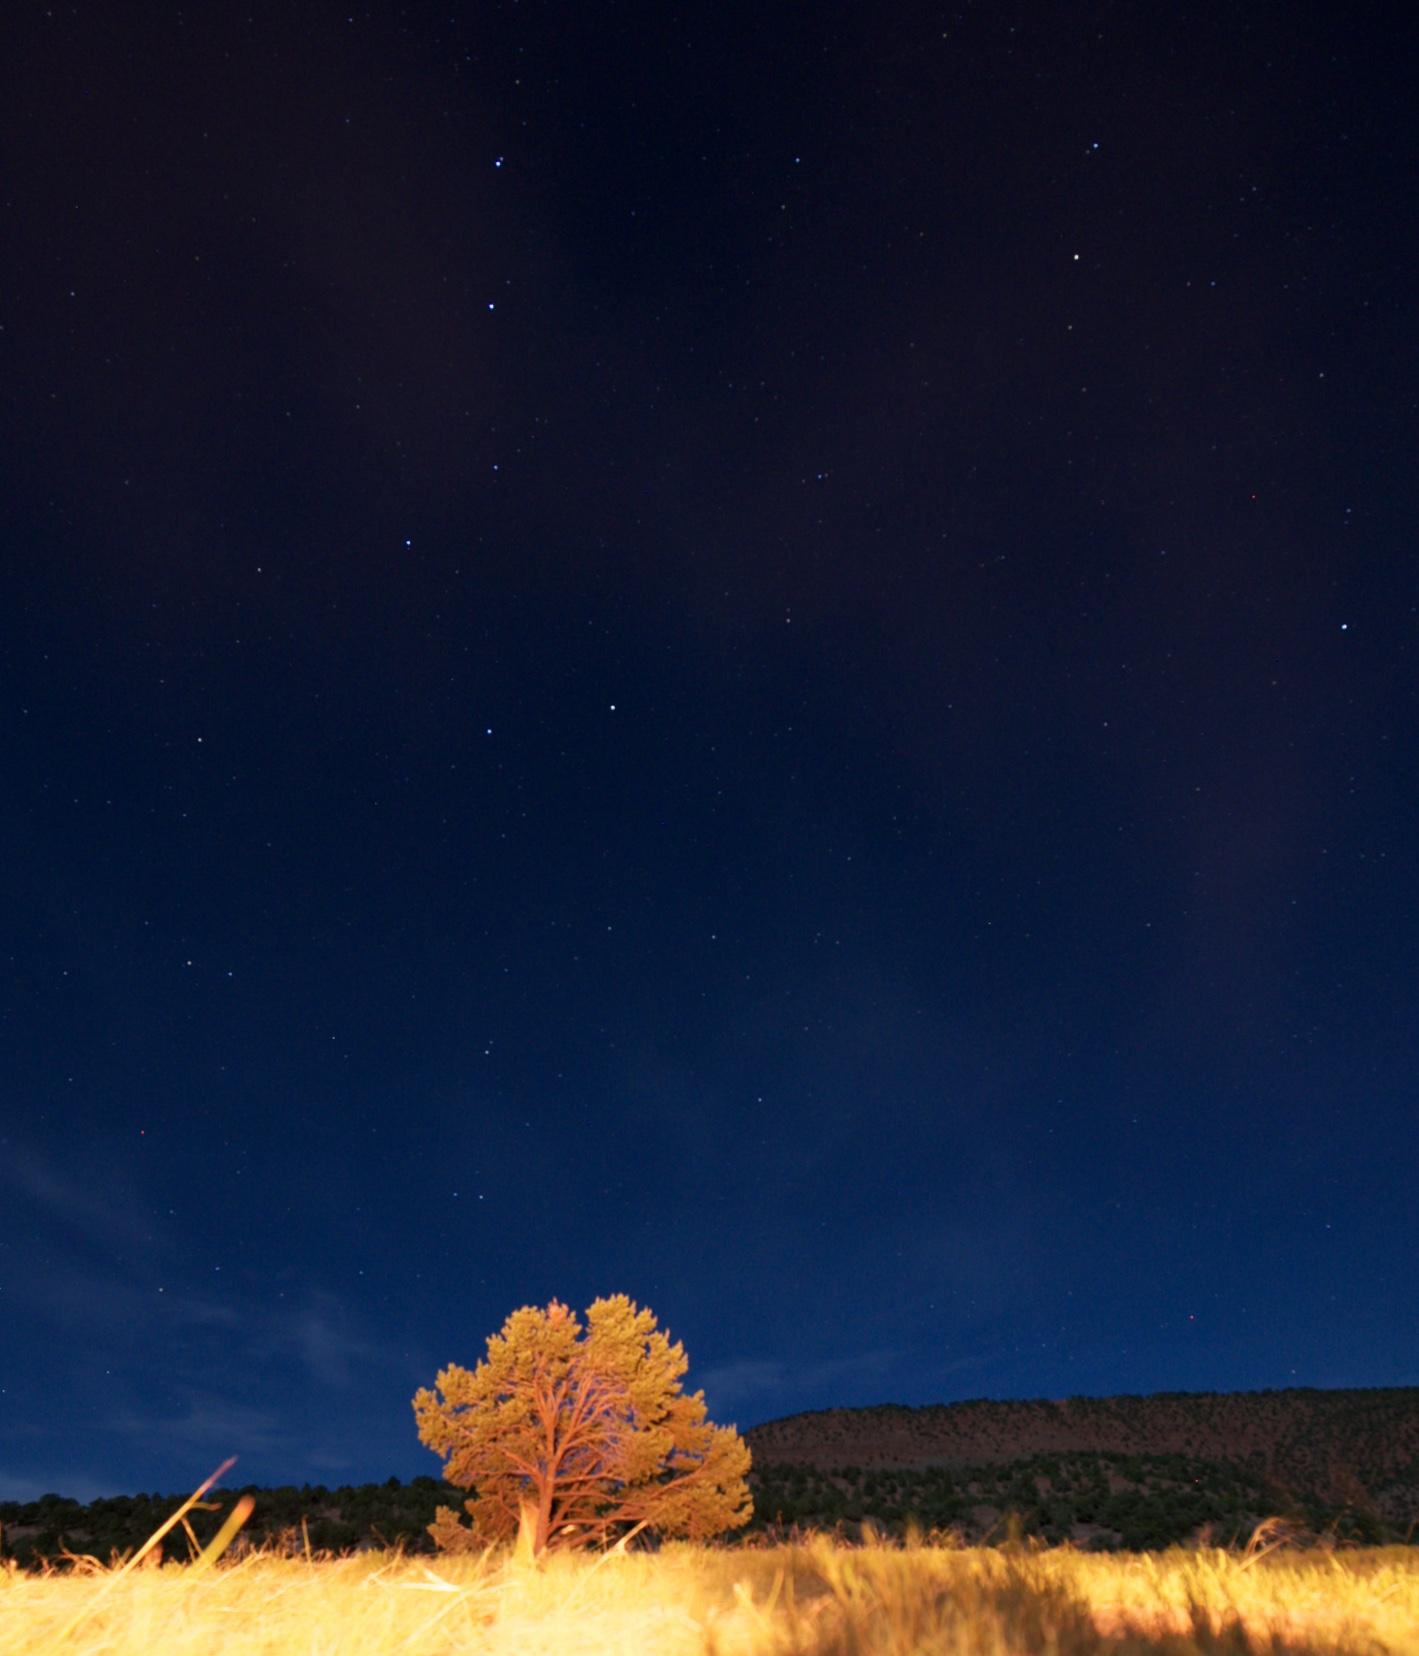 Midsummer night sky lit by a bonfire.